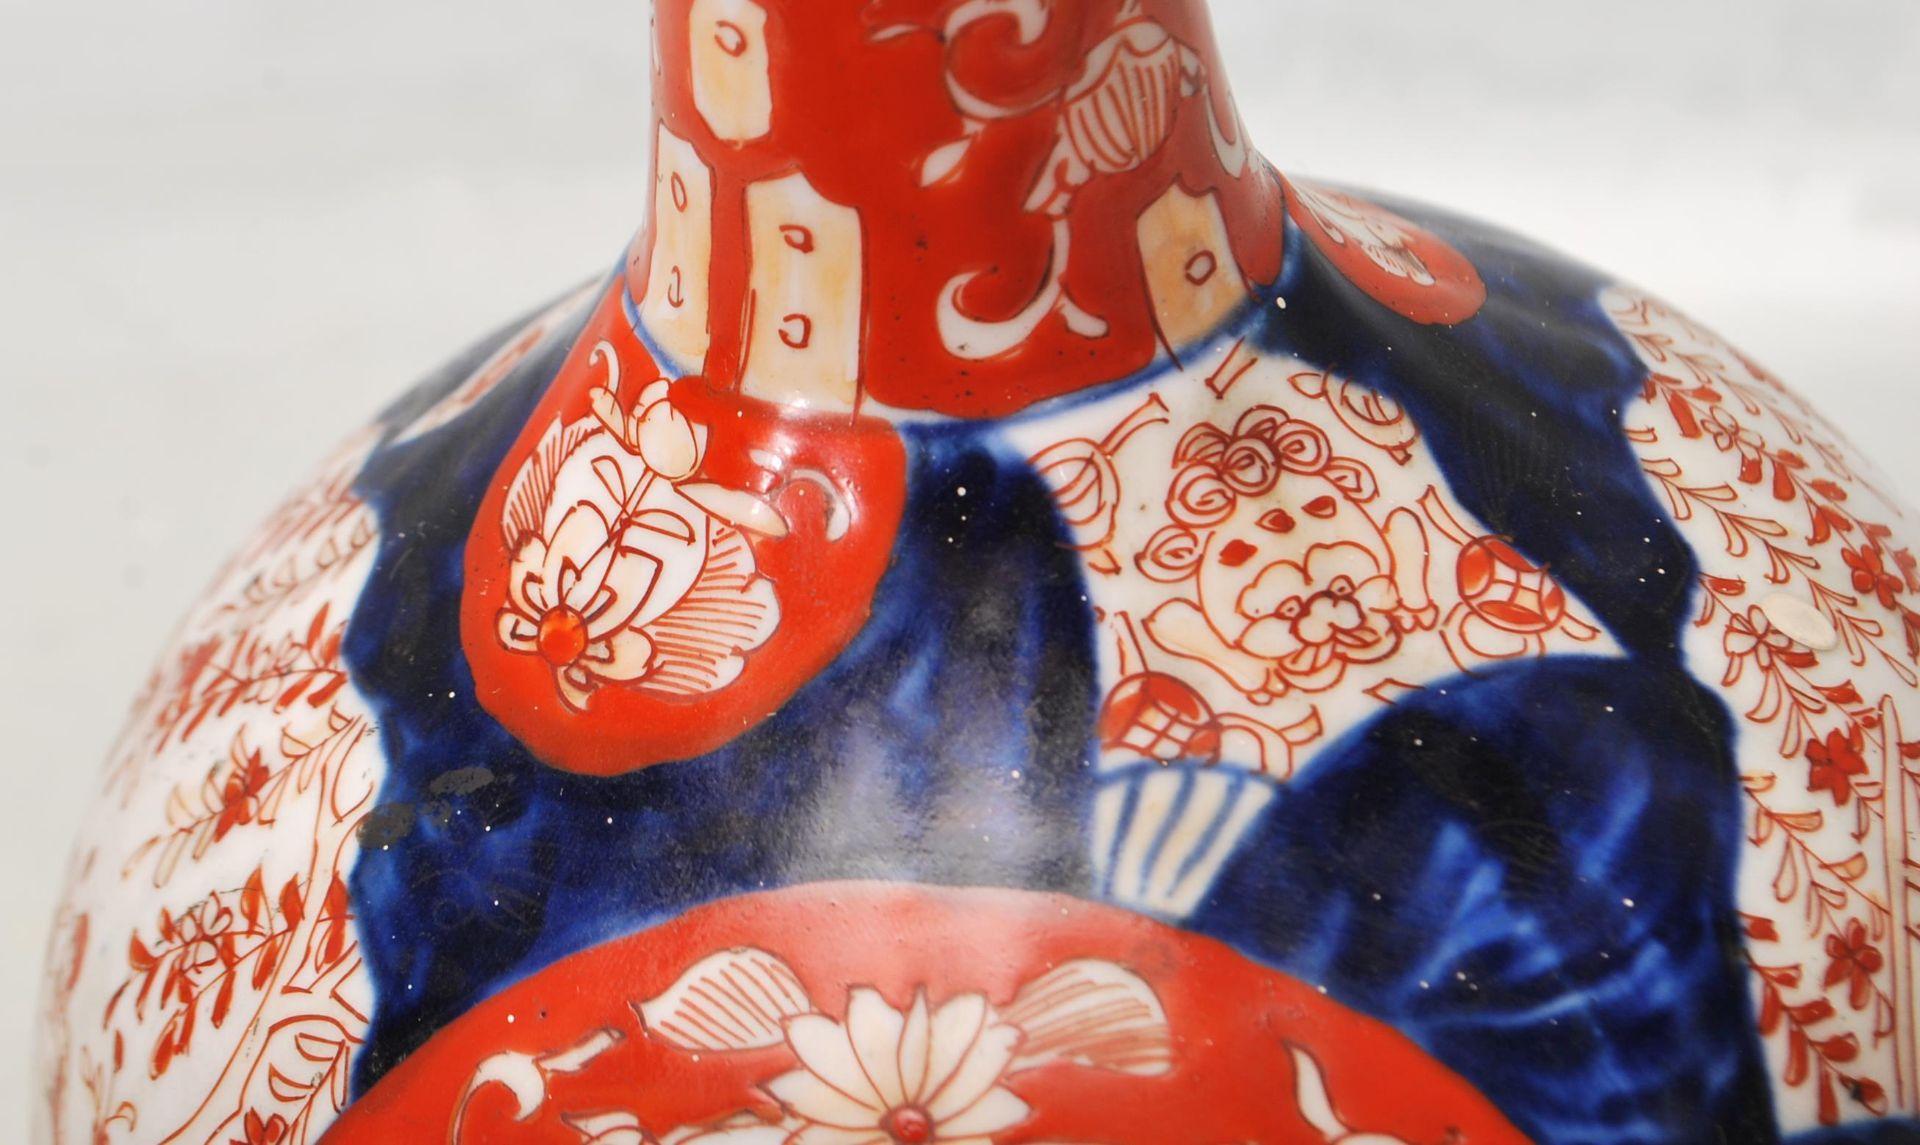 19TH CENTURY CHINESE IMARI PATTERN STEM VASE - Image 5 of 8